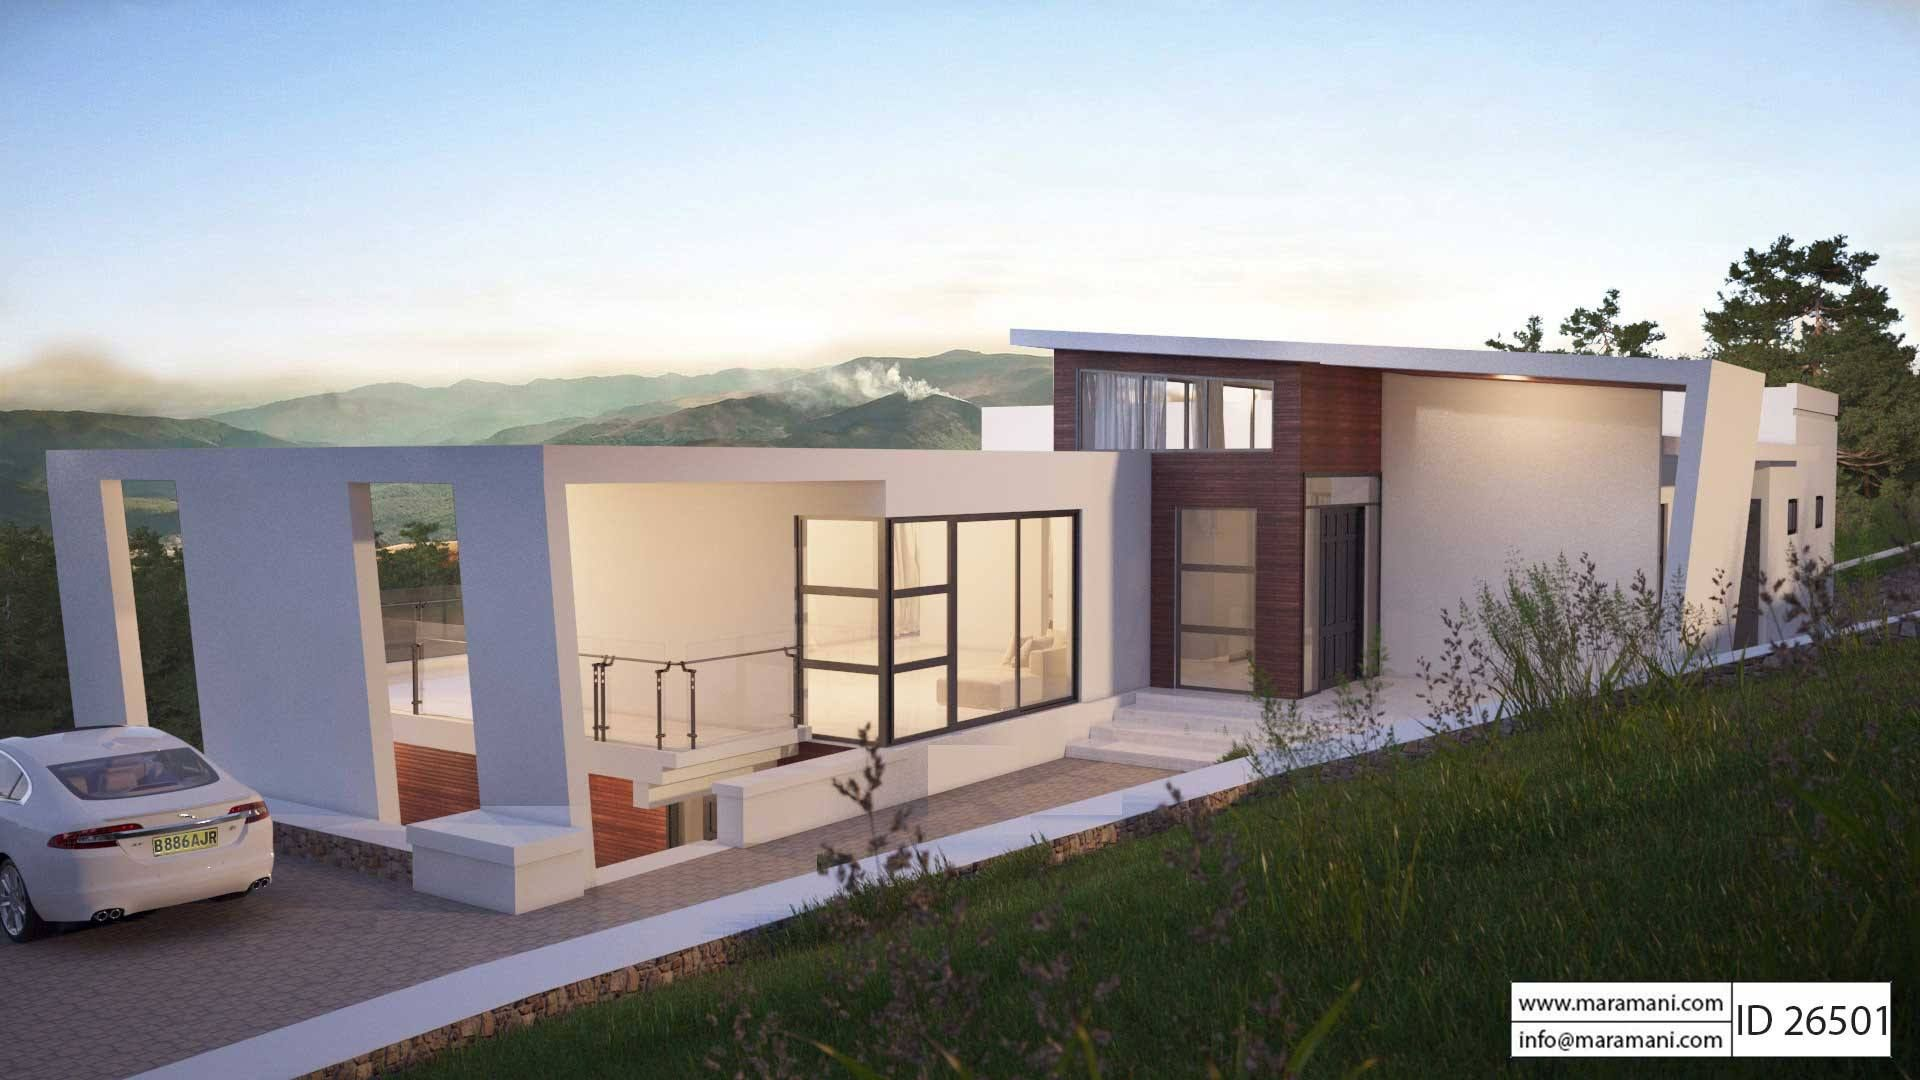 Contemporary house plan id 26501 maramani com